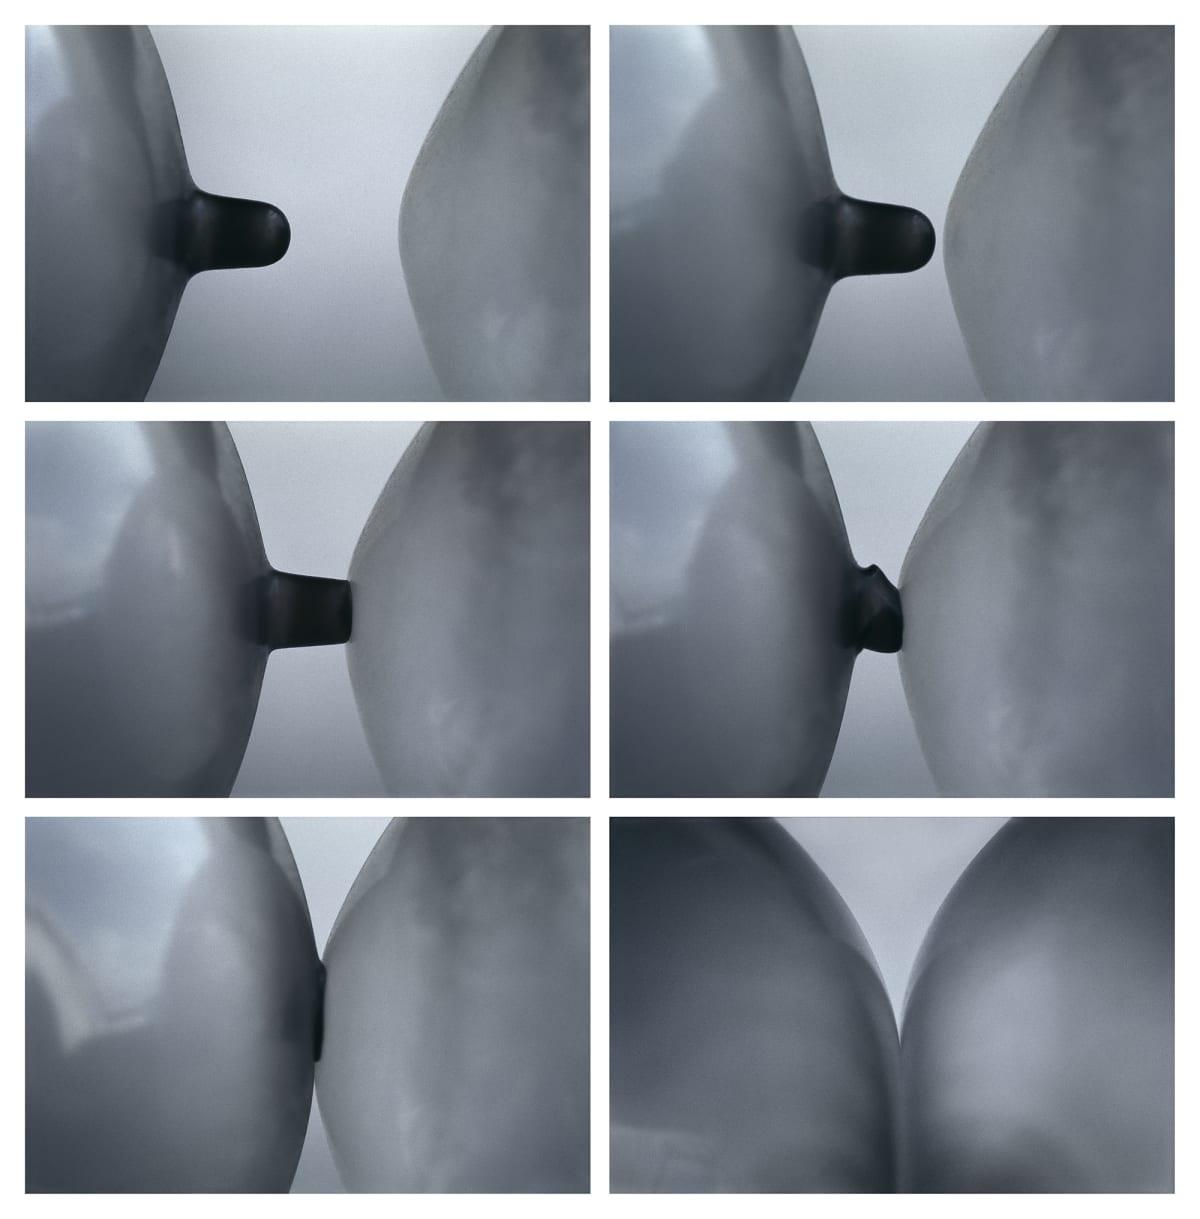 Renate BERTLMANN Zärtliche Berührungen (Tender Touches), 1976/2017 Digital photographs, mounted on dibond 95.5 x 97 cm Edition 1 of 5 (Plus 2 AP's)